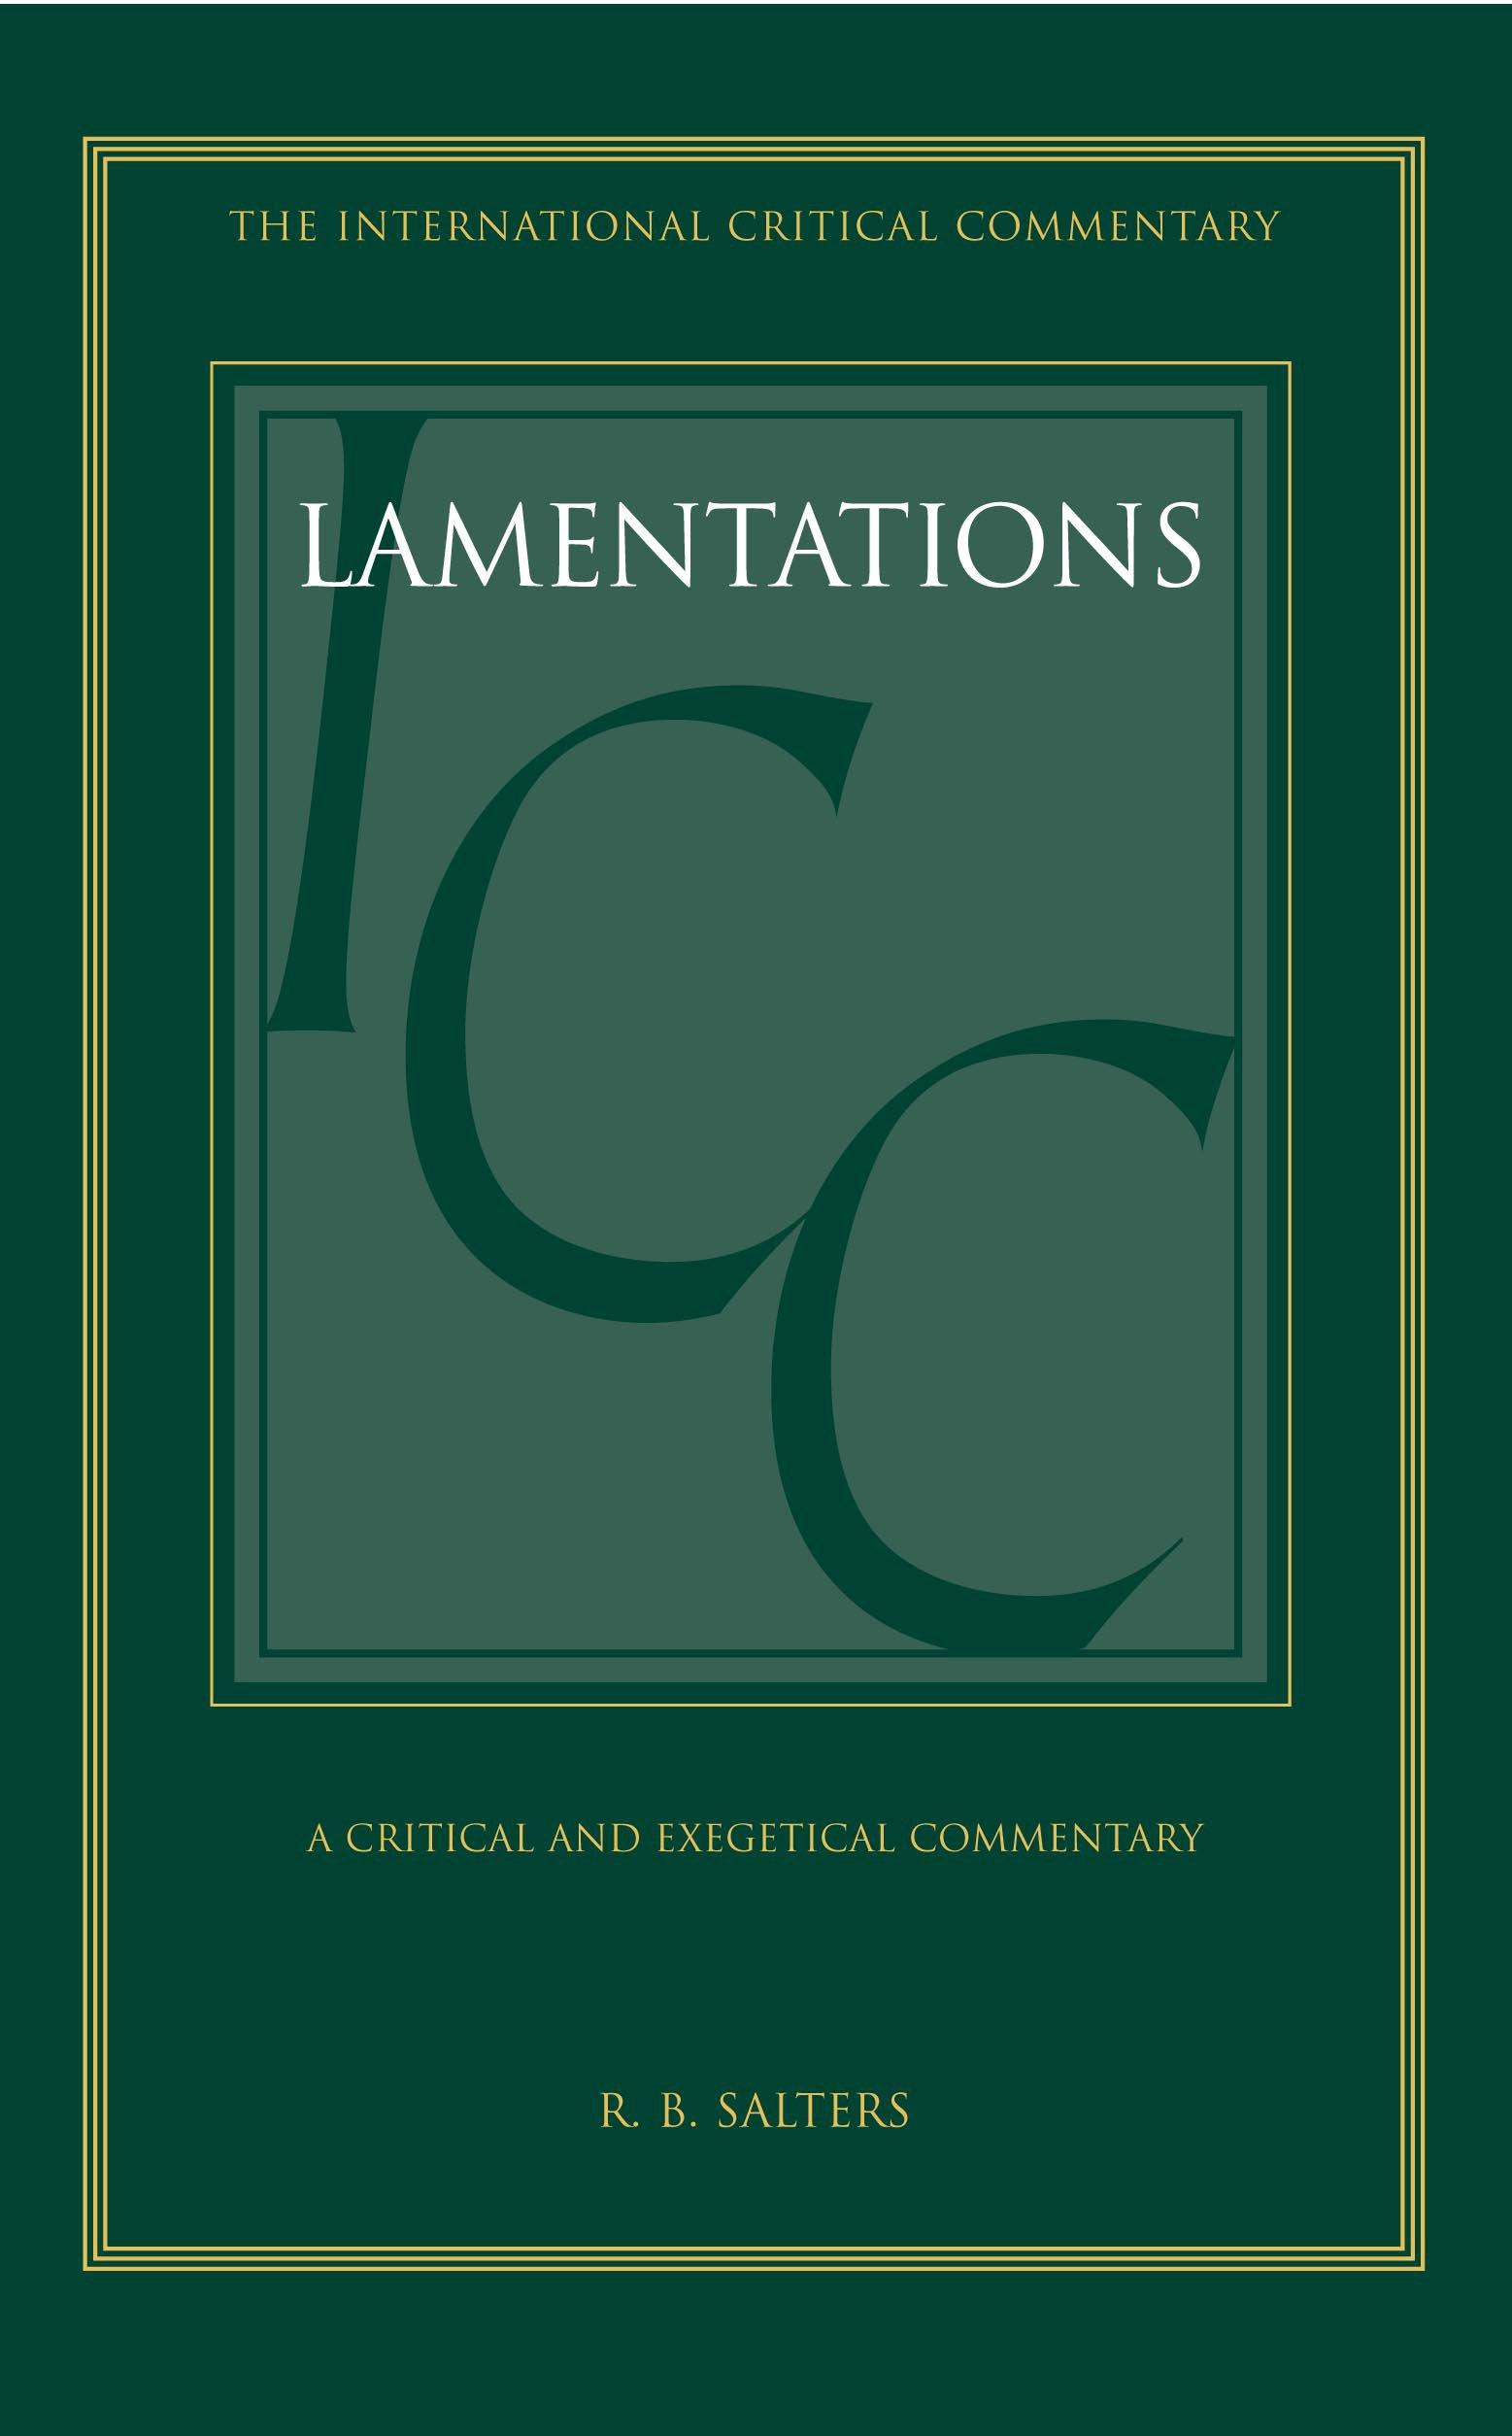 Lamentations icc a critical and exegetical commentary international critical commentary amazon co uk r b salters graham davies john a emerton